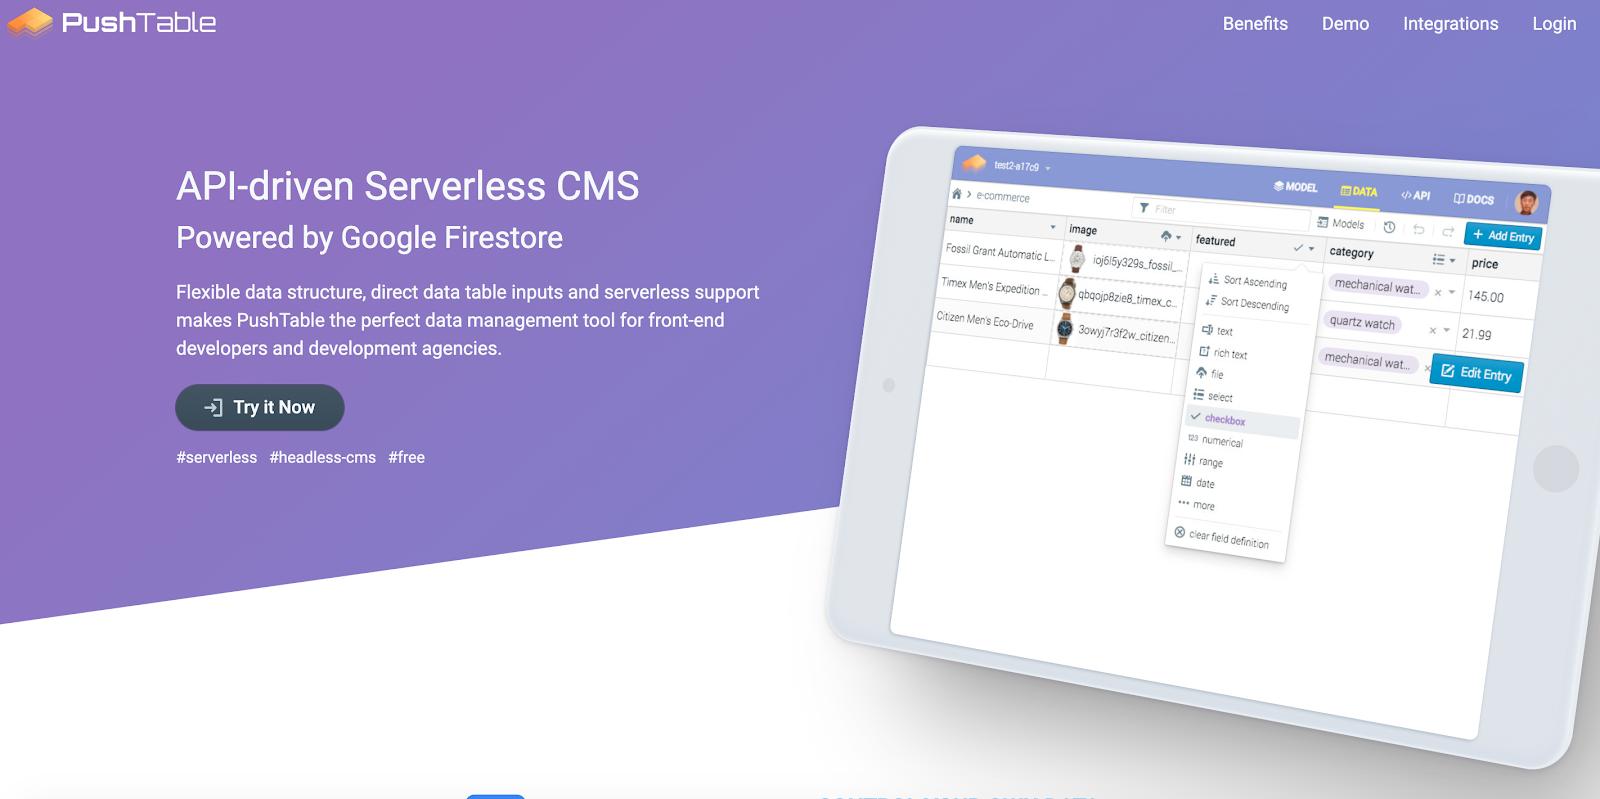 PushTable utililzes Googles global CDN for snappy serverless delivery